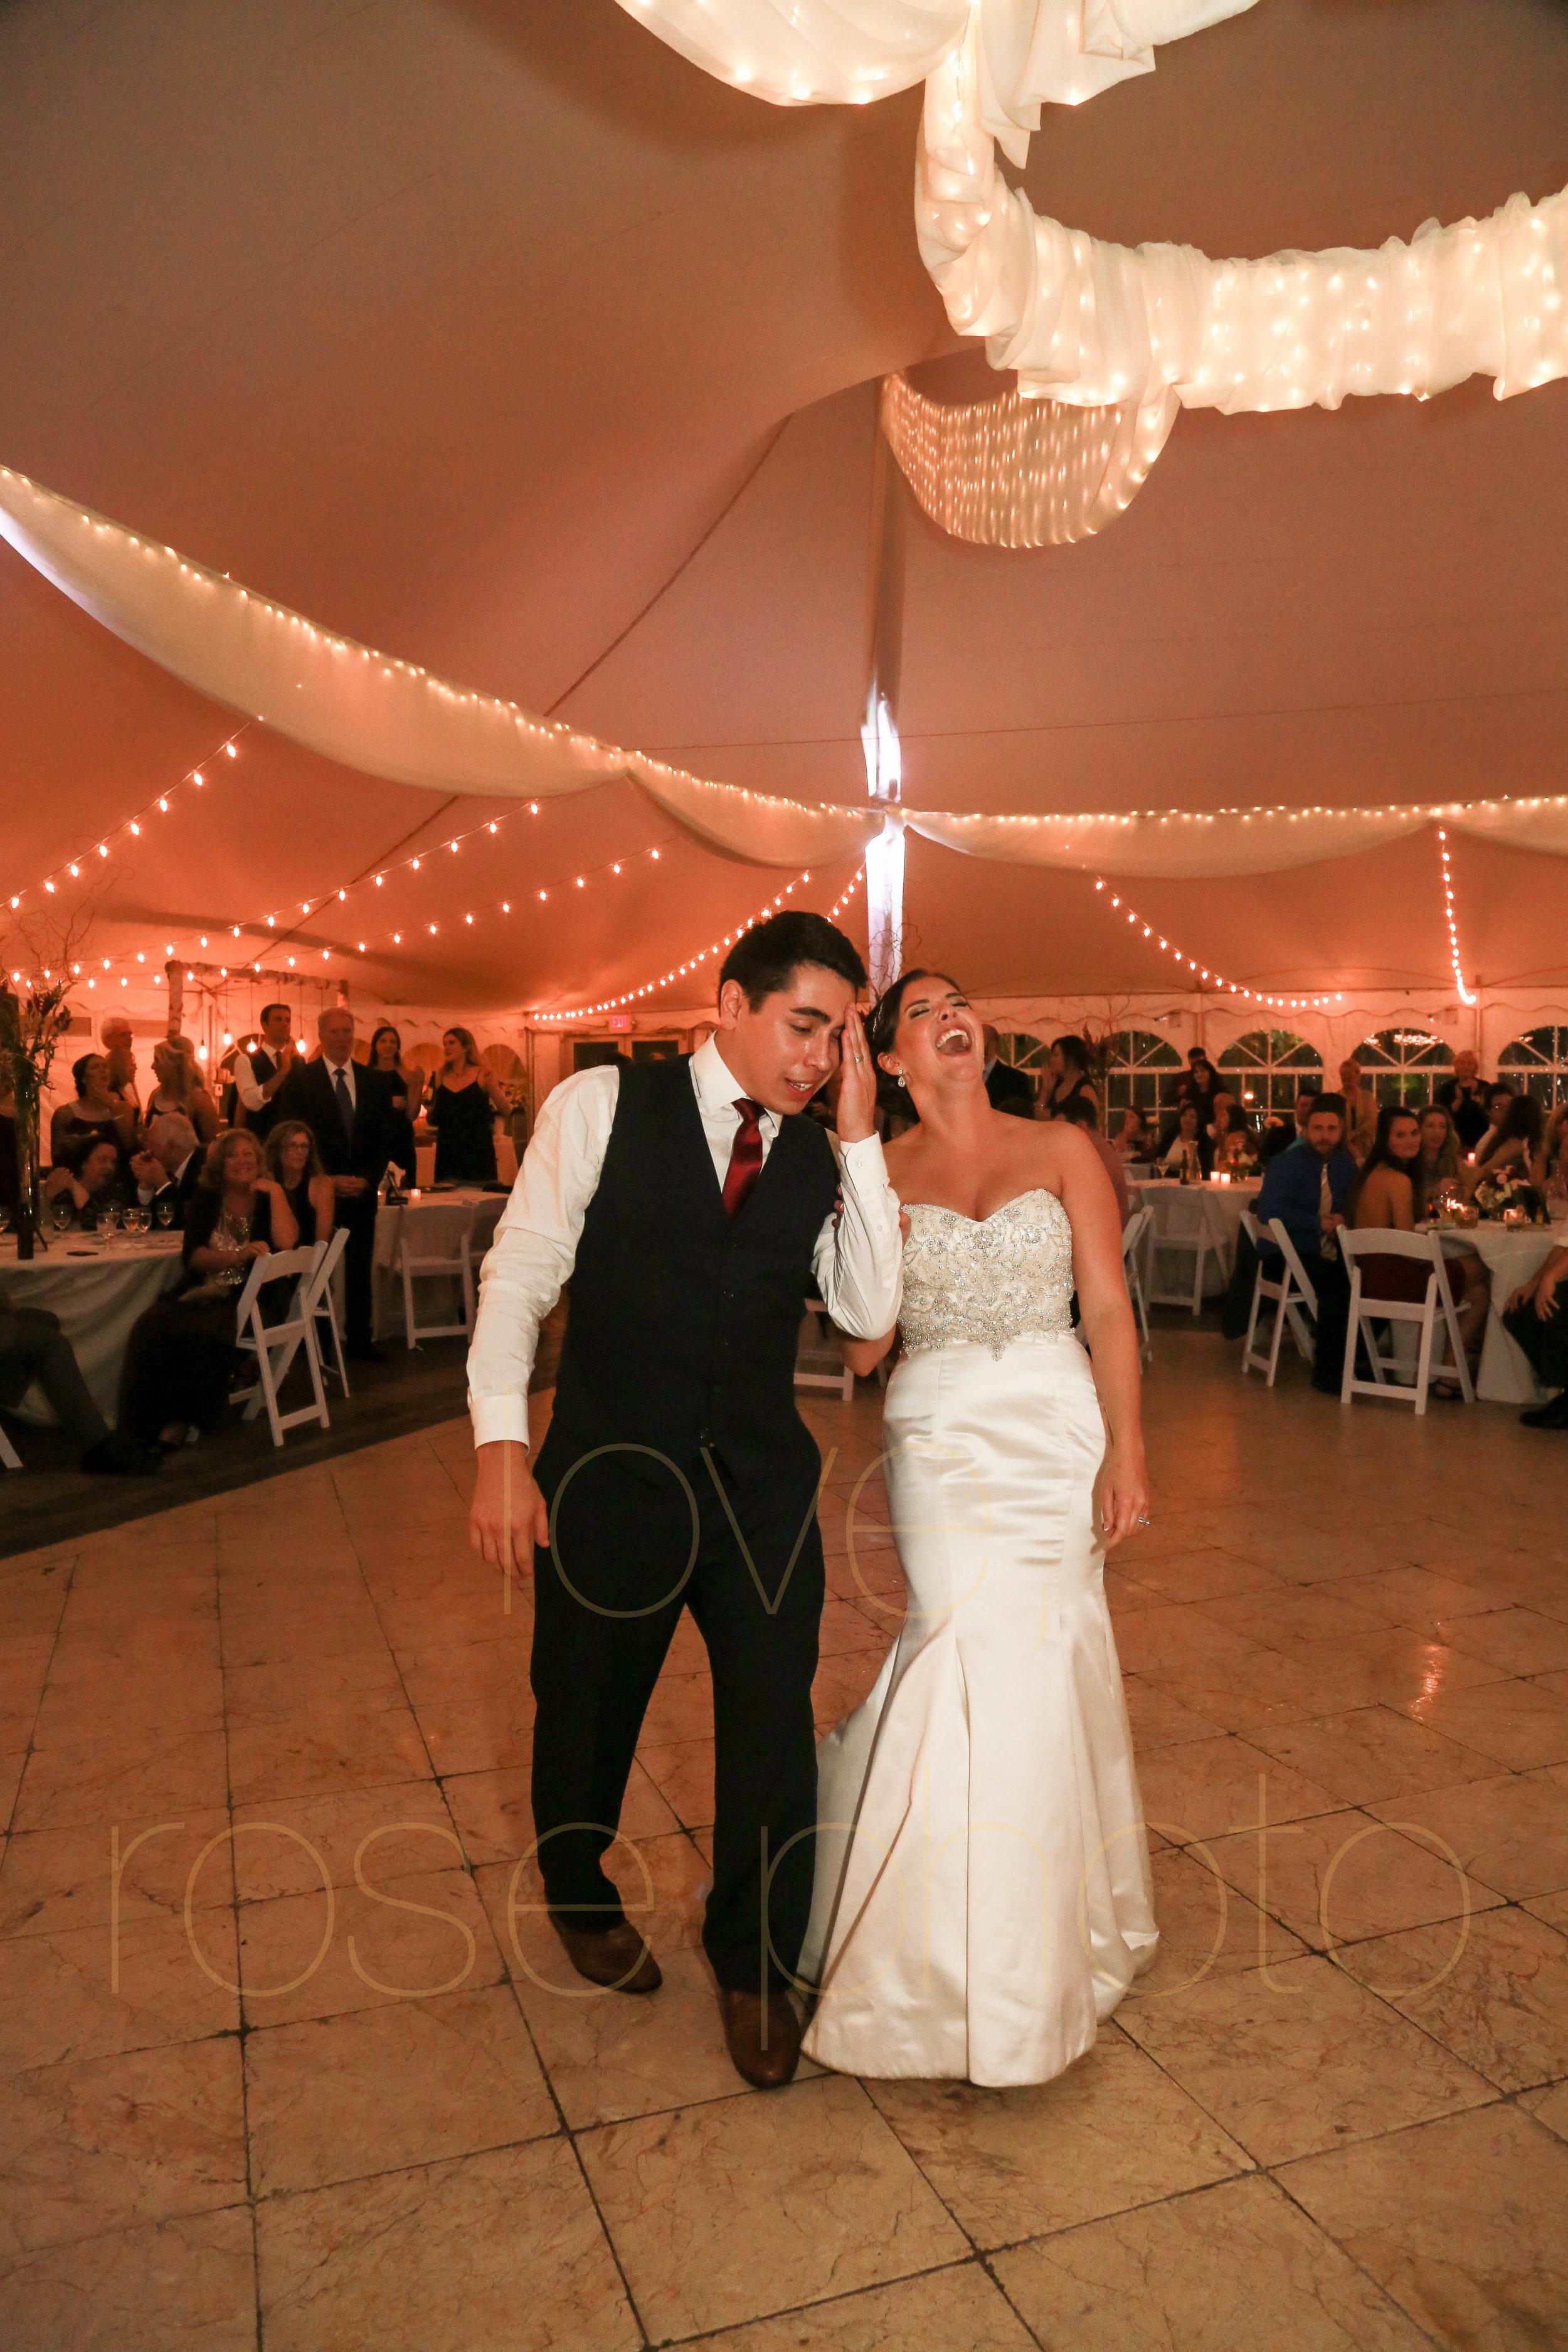 Alison + Mike Chicago Wedding Photographer Blog -23.jpg